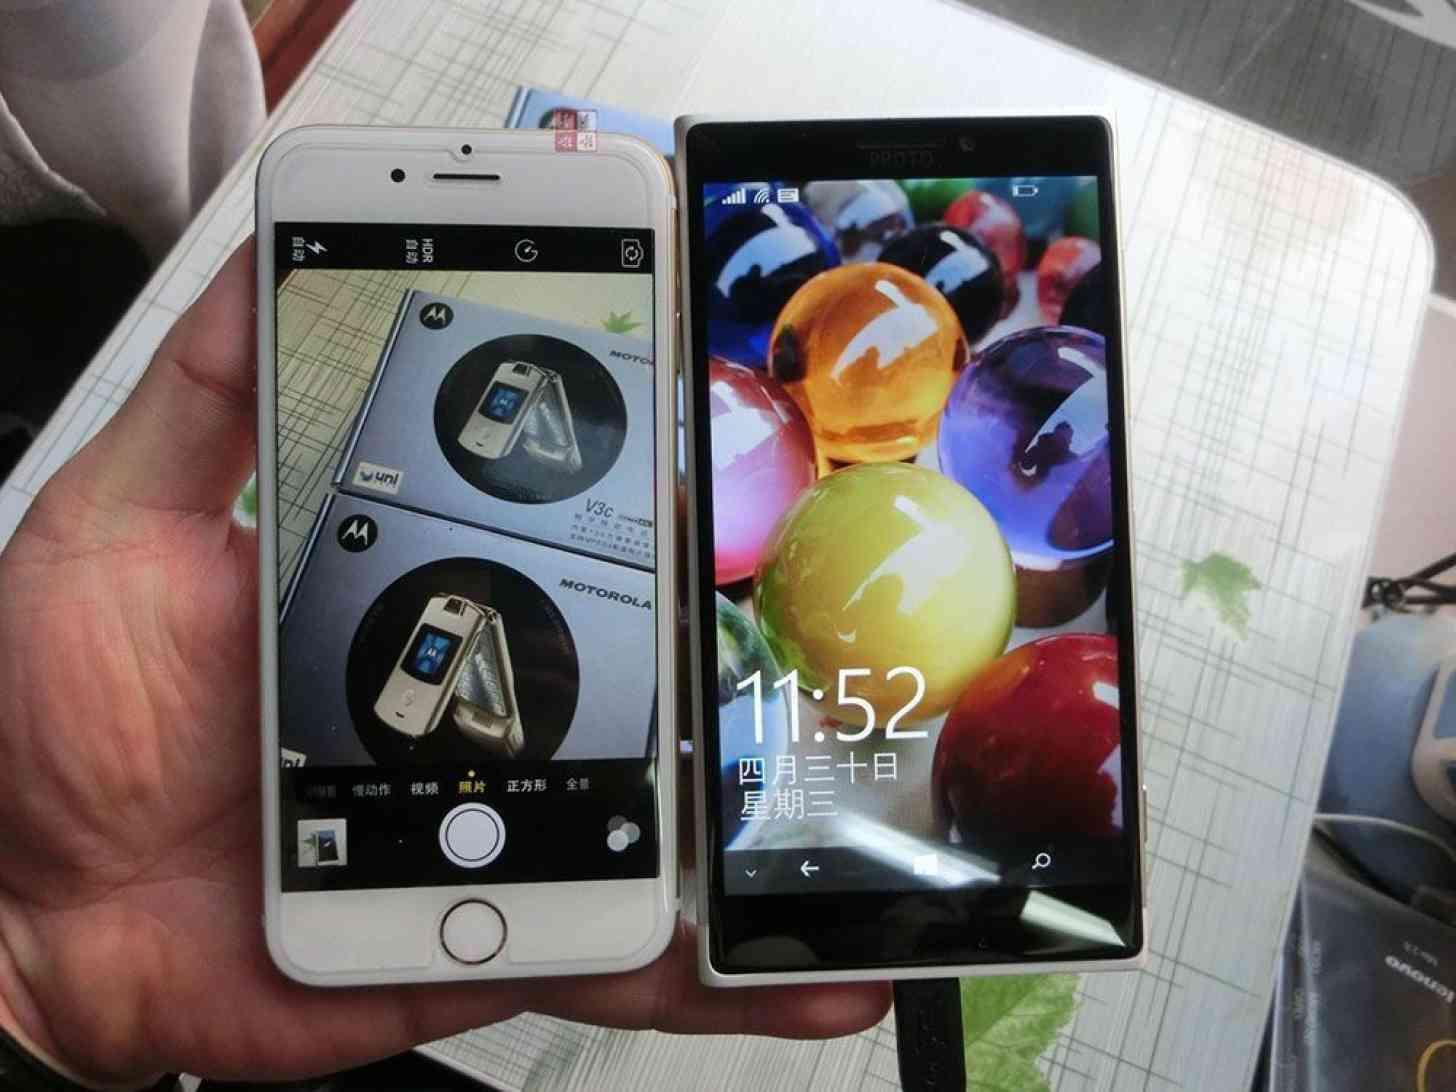 Nokia McLaren RM-1052 Lumia 1030 front iPhone 6